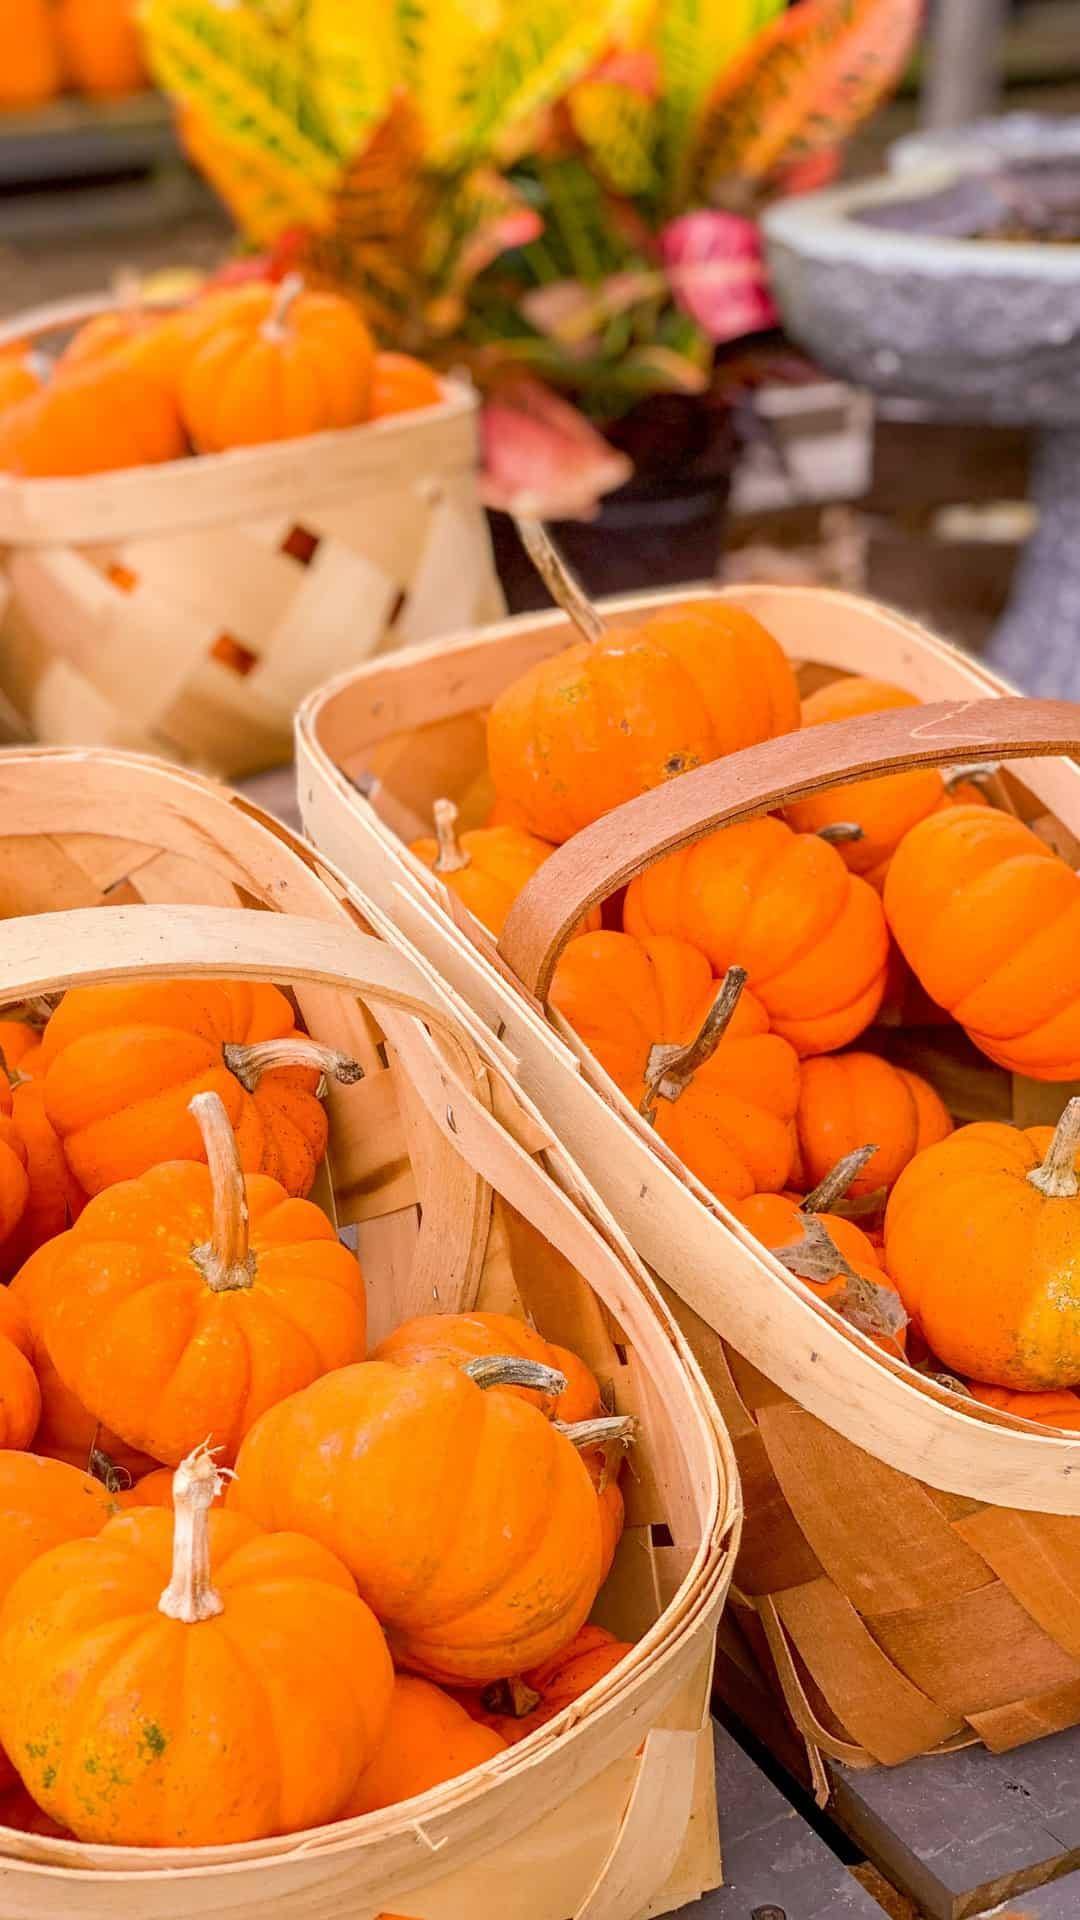 Autumn Wallpaper iPhone Aesthetic Petite Pumpkins